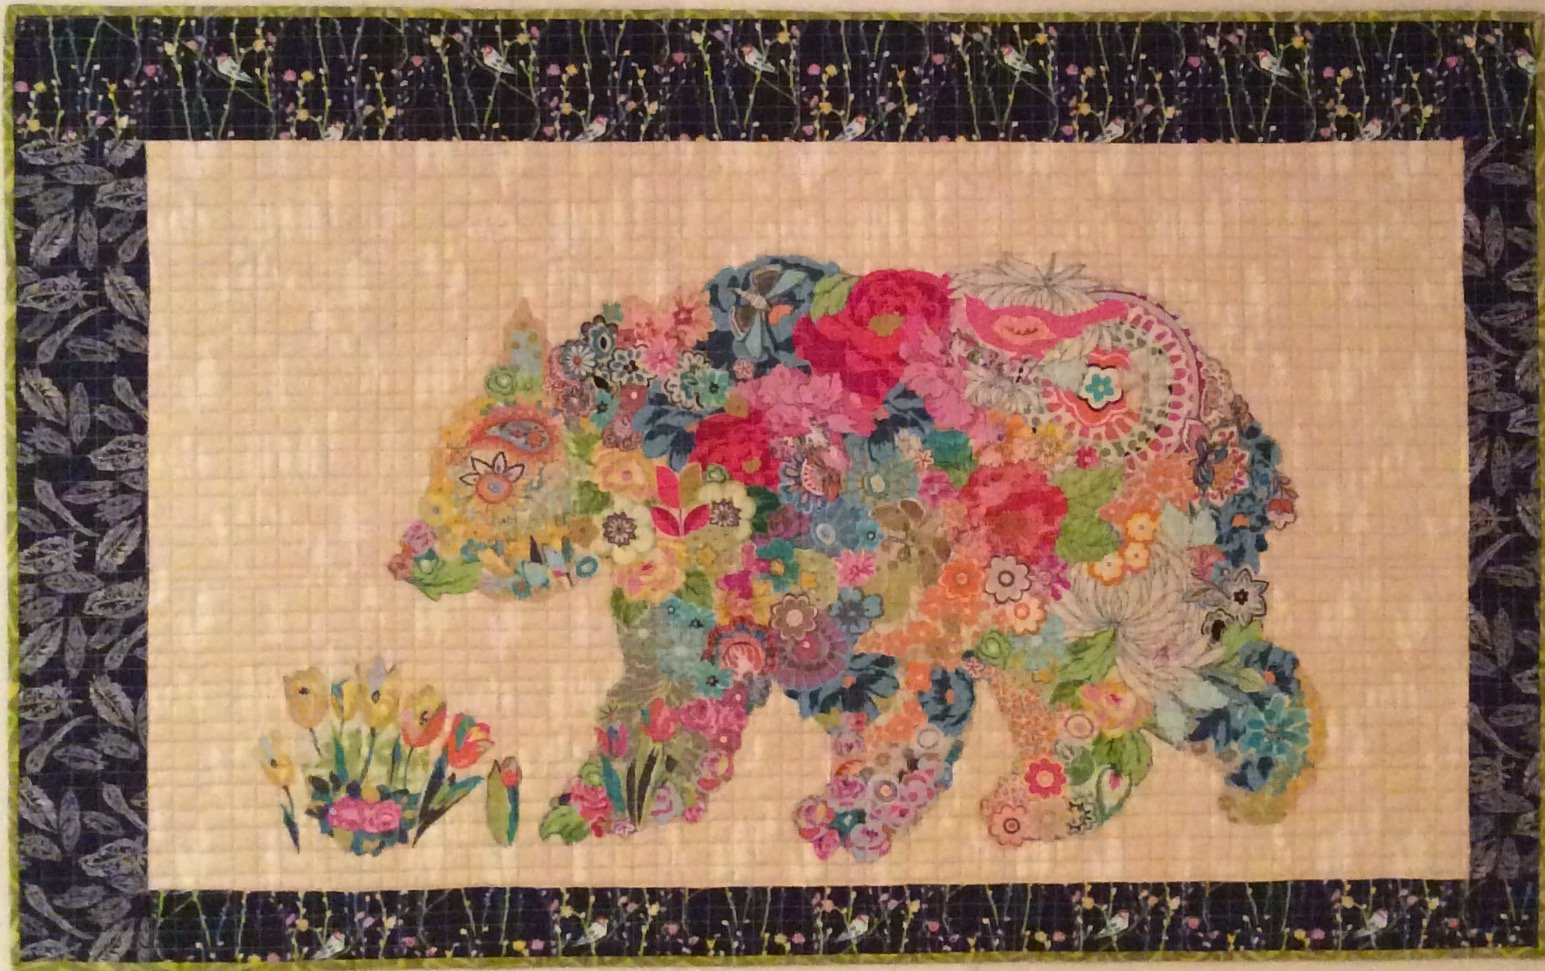 Paisley Bear Collage Quilt Pattern by Laura Heine : photo collage quilt - Adamdwight.com